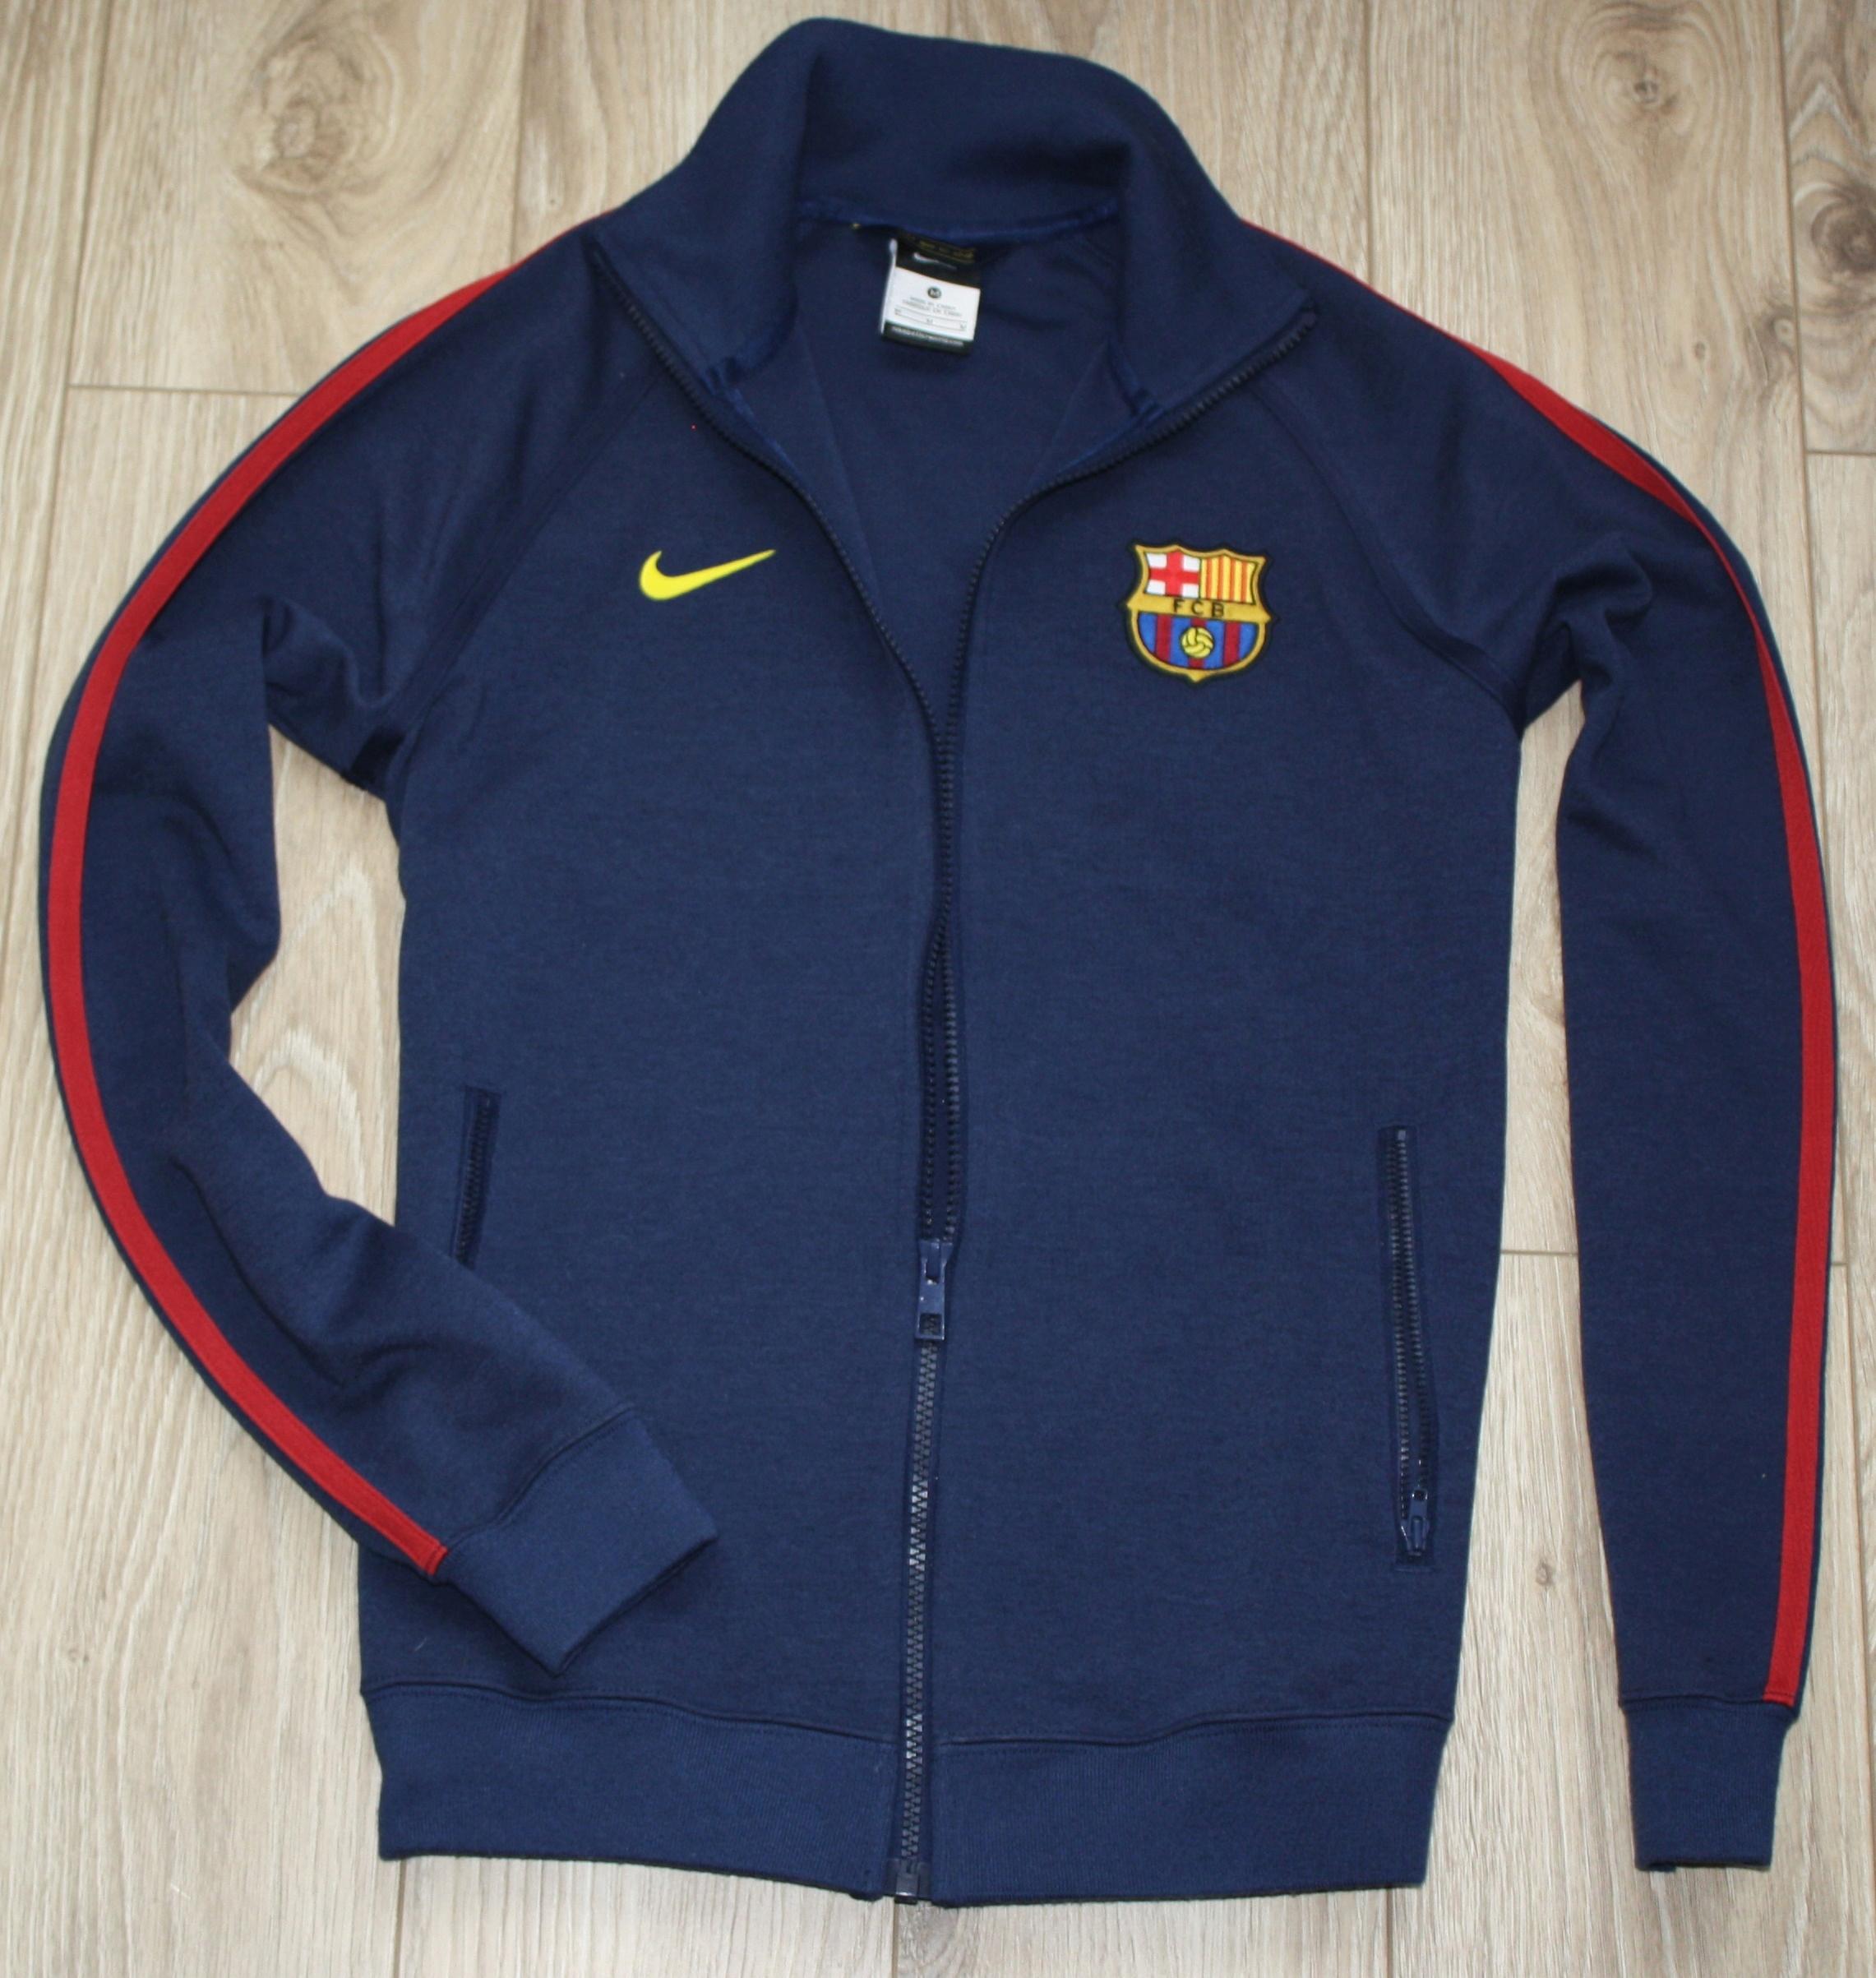 FC BARCELONA _ NIKE _ BLUZA _ M _ JEDYNA OKAZJA _